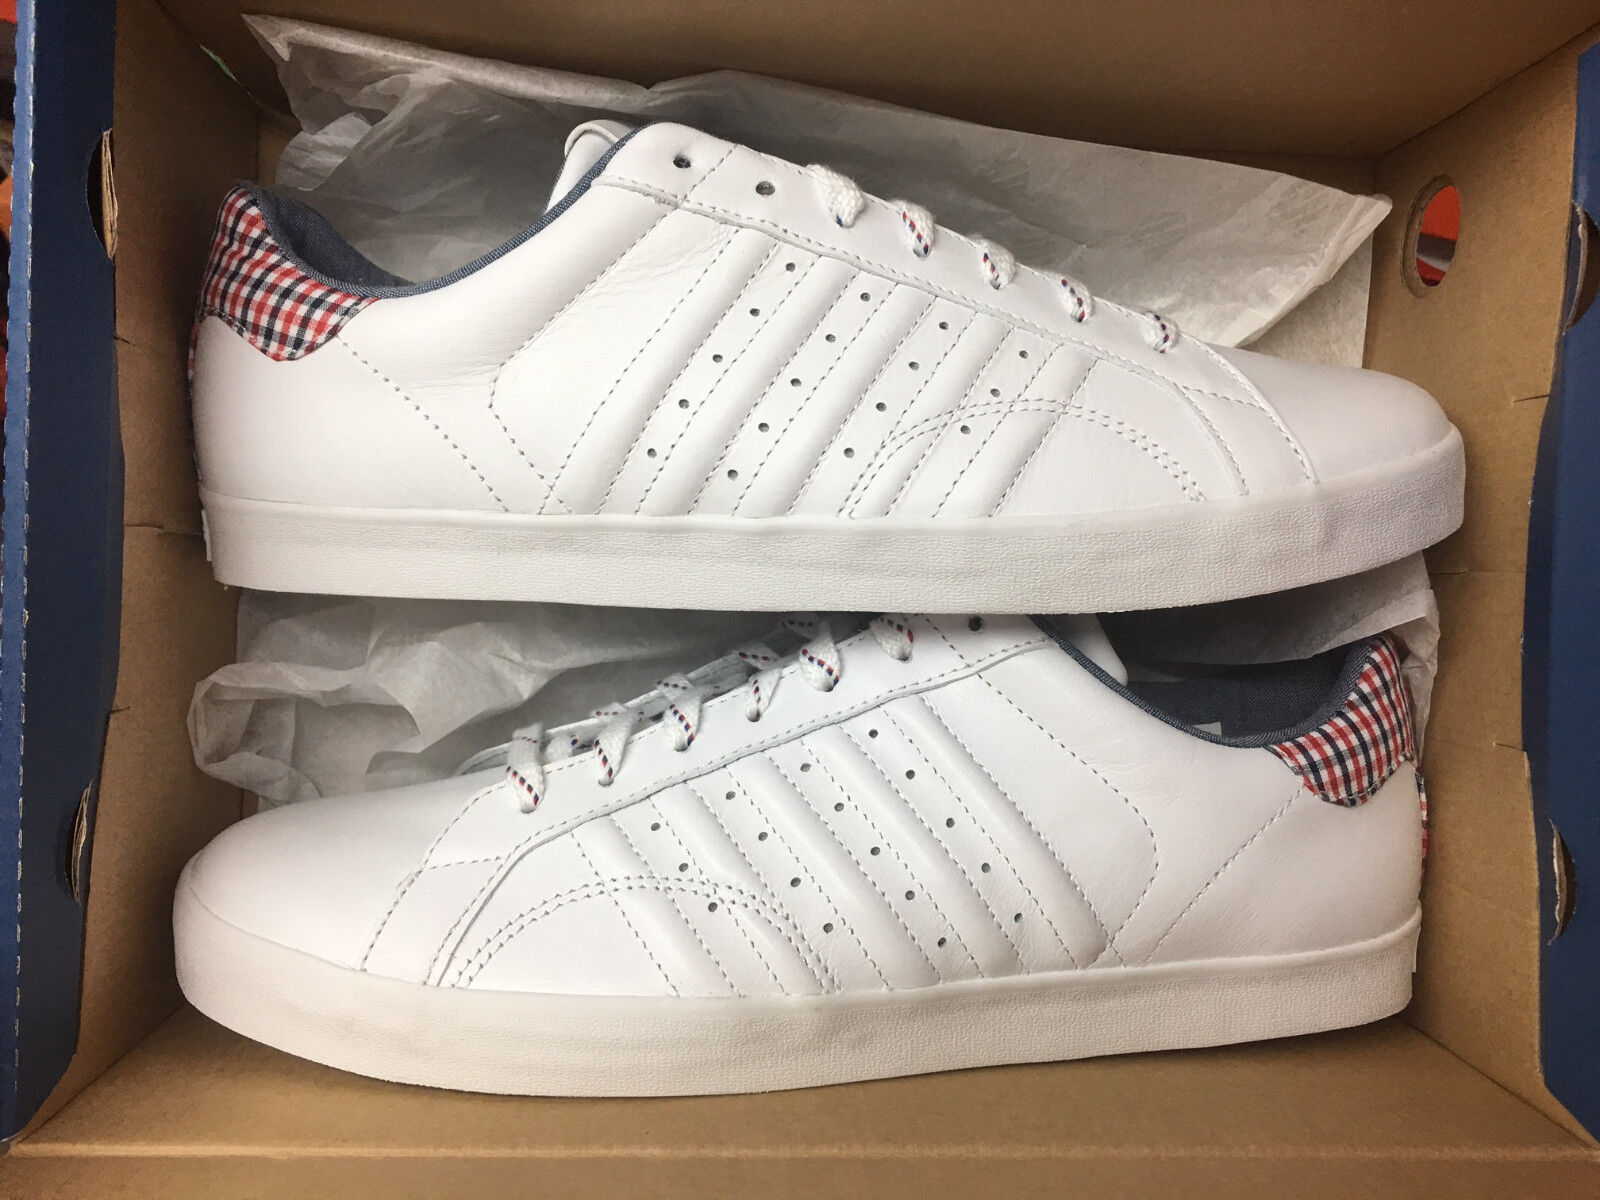 K-Swiss Belmont Plaid Sneaker Neu Gr:44,5 Weiß 03447-161M Sneaker Plaid Leder Weiß Schuhe ee6a95